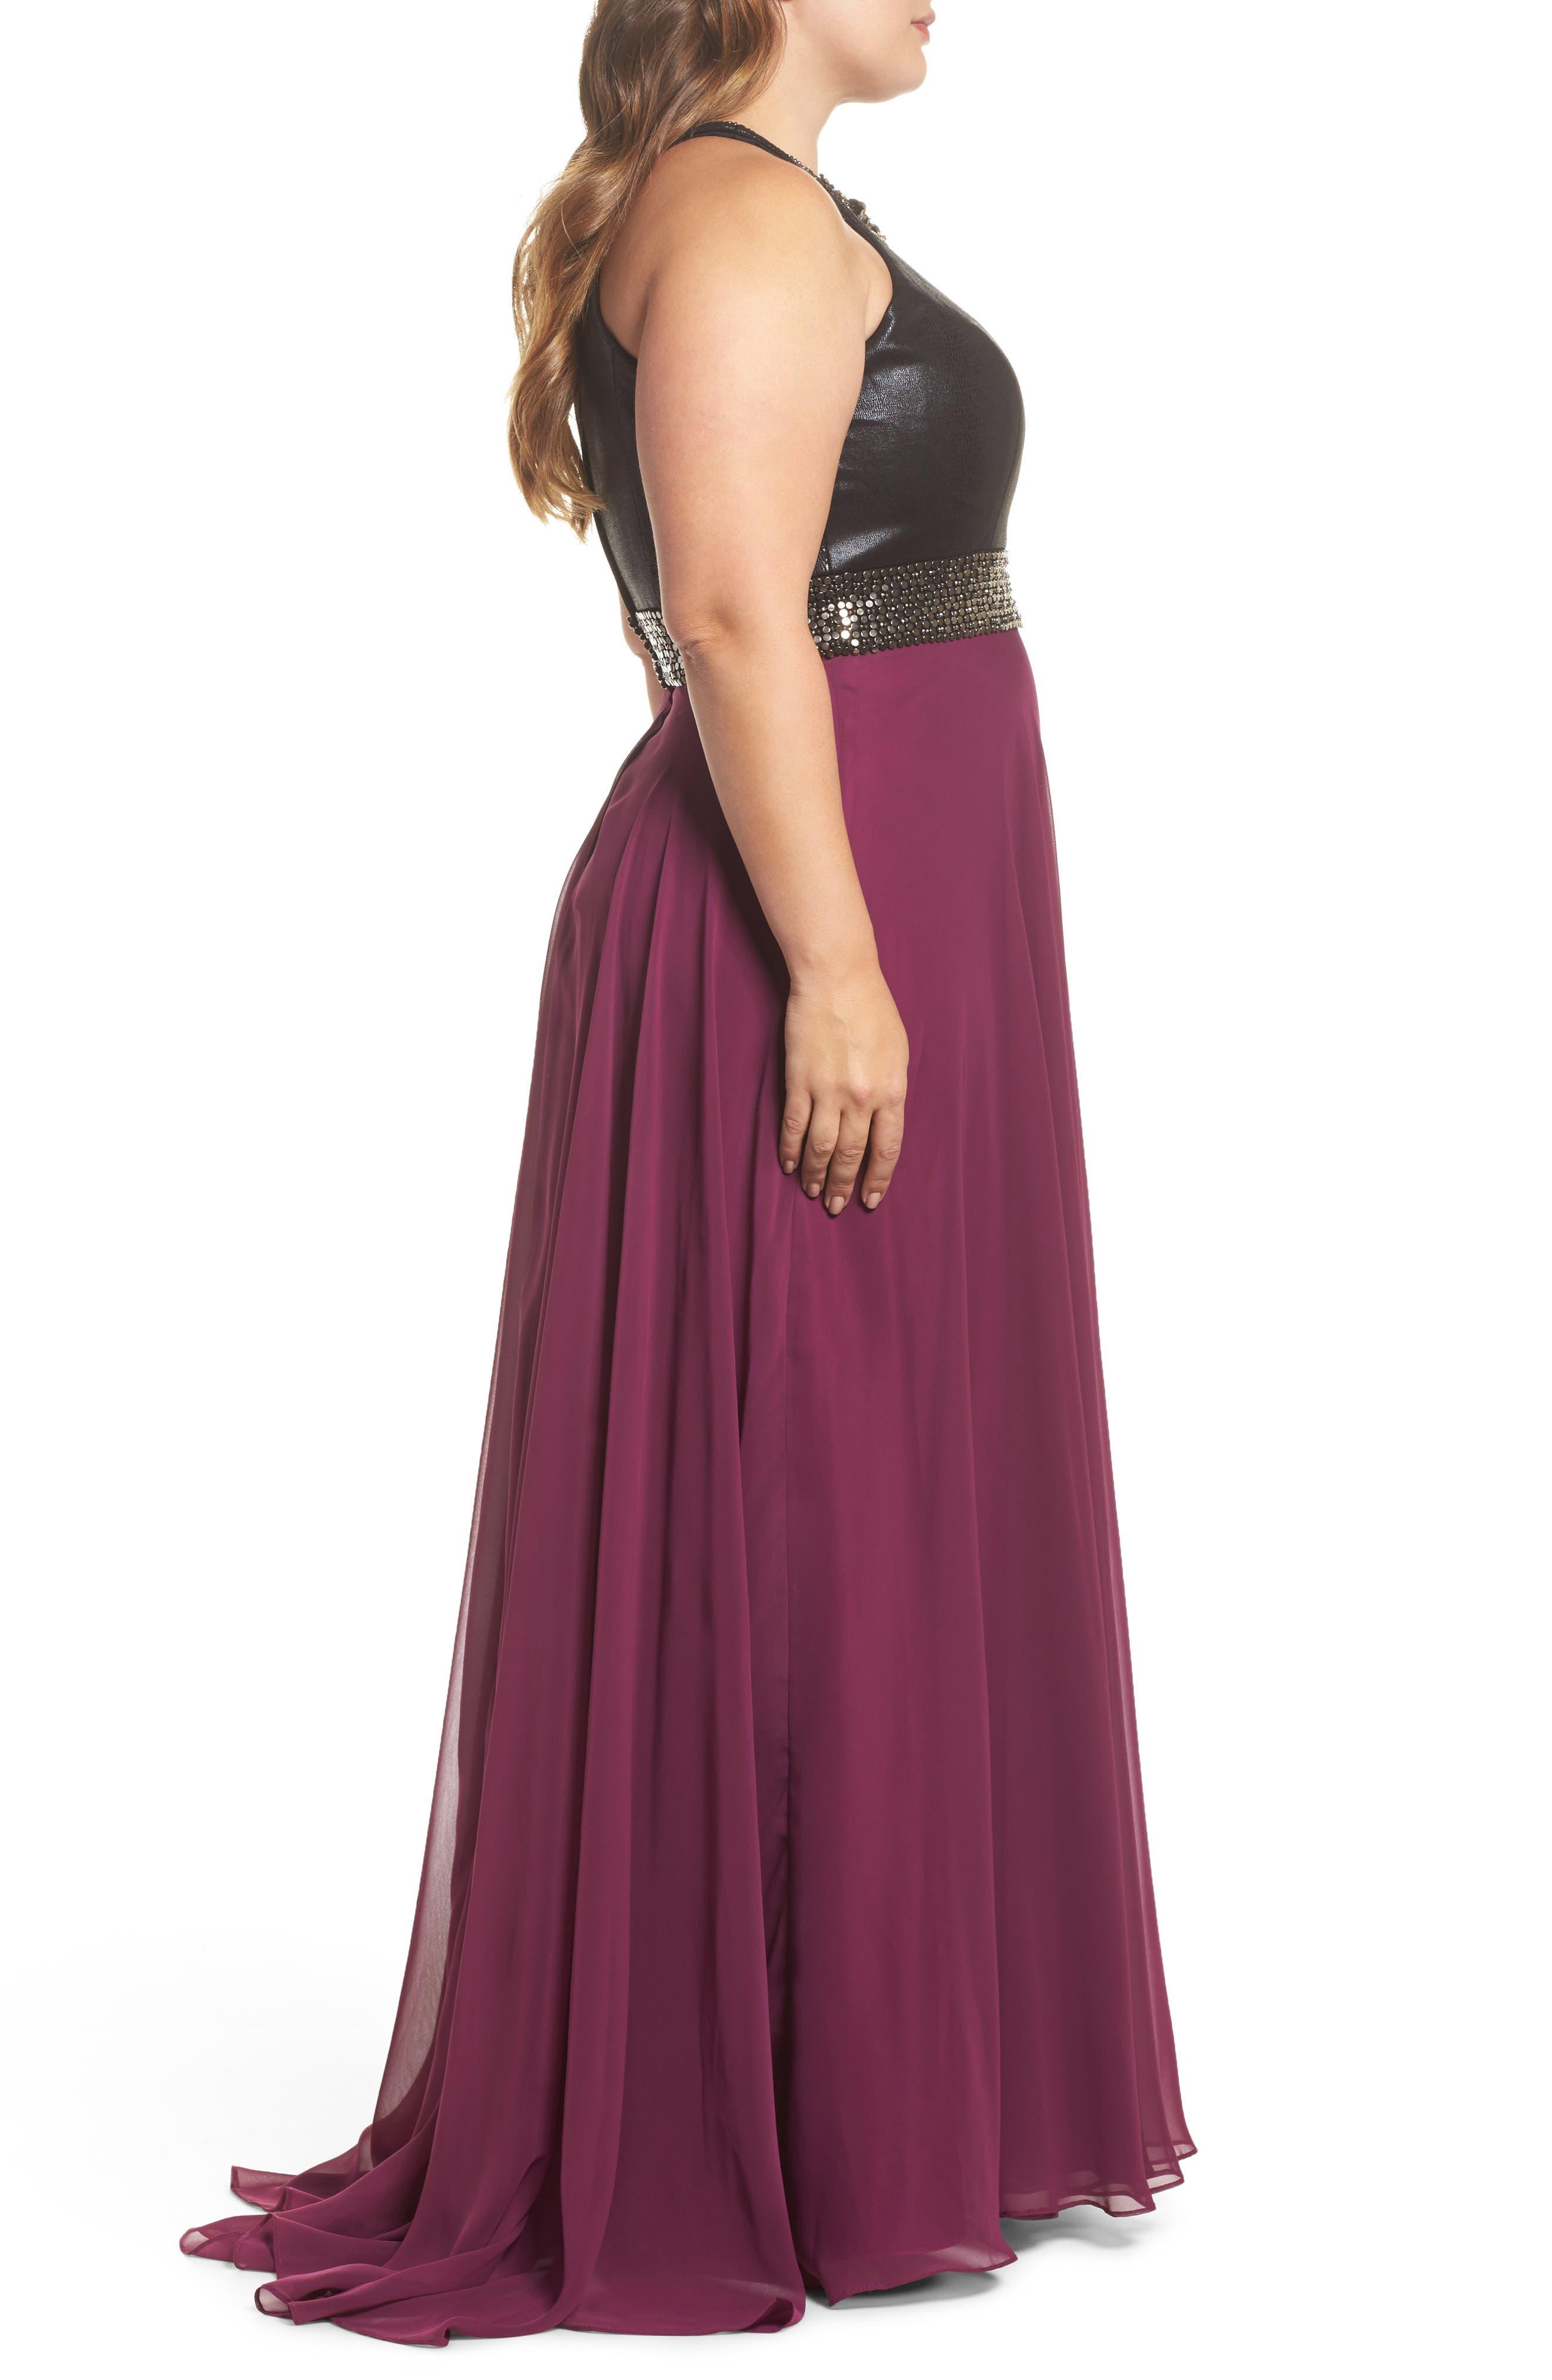 Beaded High Neck Gown,                             Alternate thumbnail 3, color,                             Purple/ Black